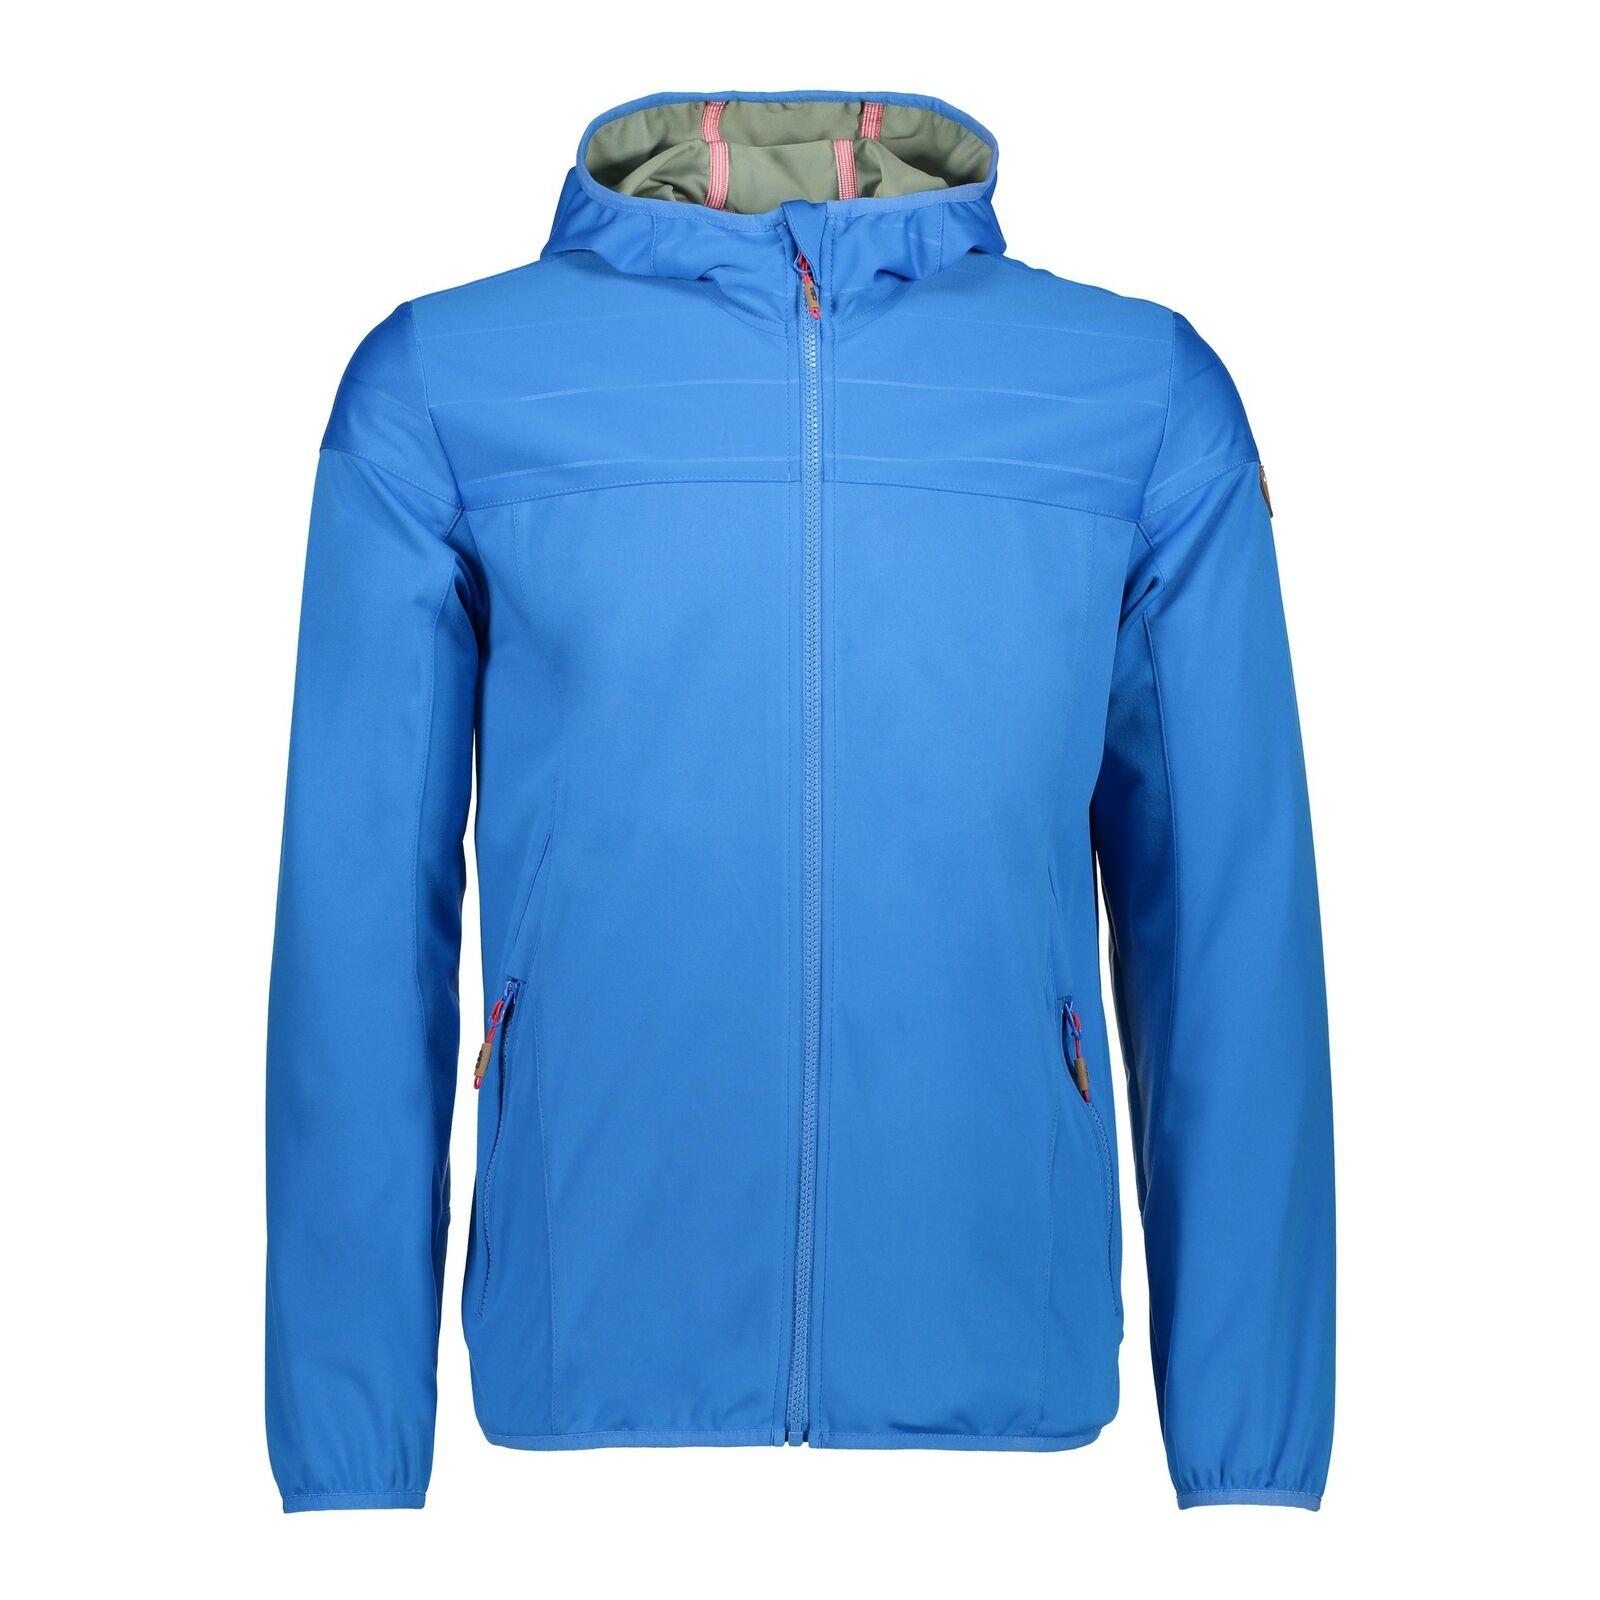 CMP Softshelljacke Jacke Man Fix Hood Jacket blau winddicht wasserdicht